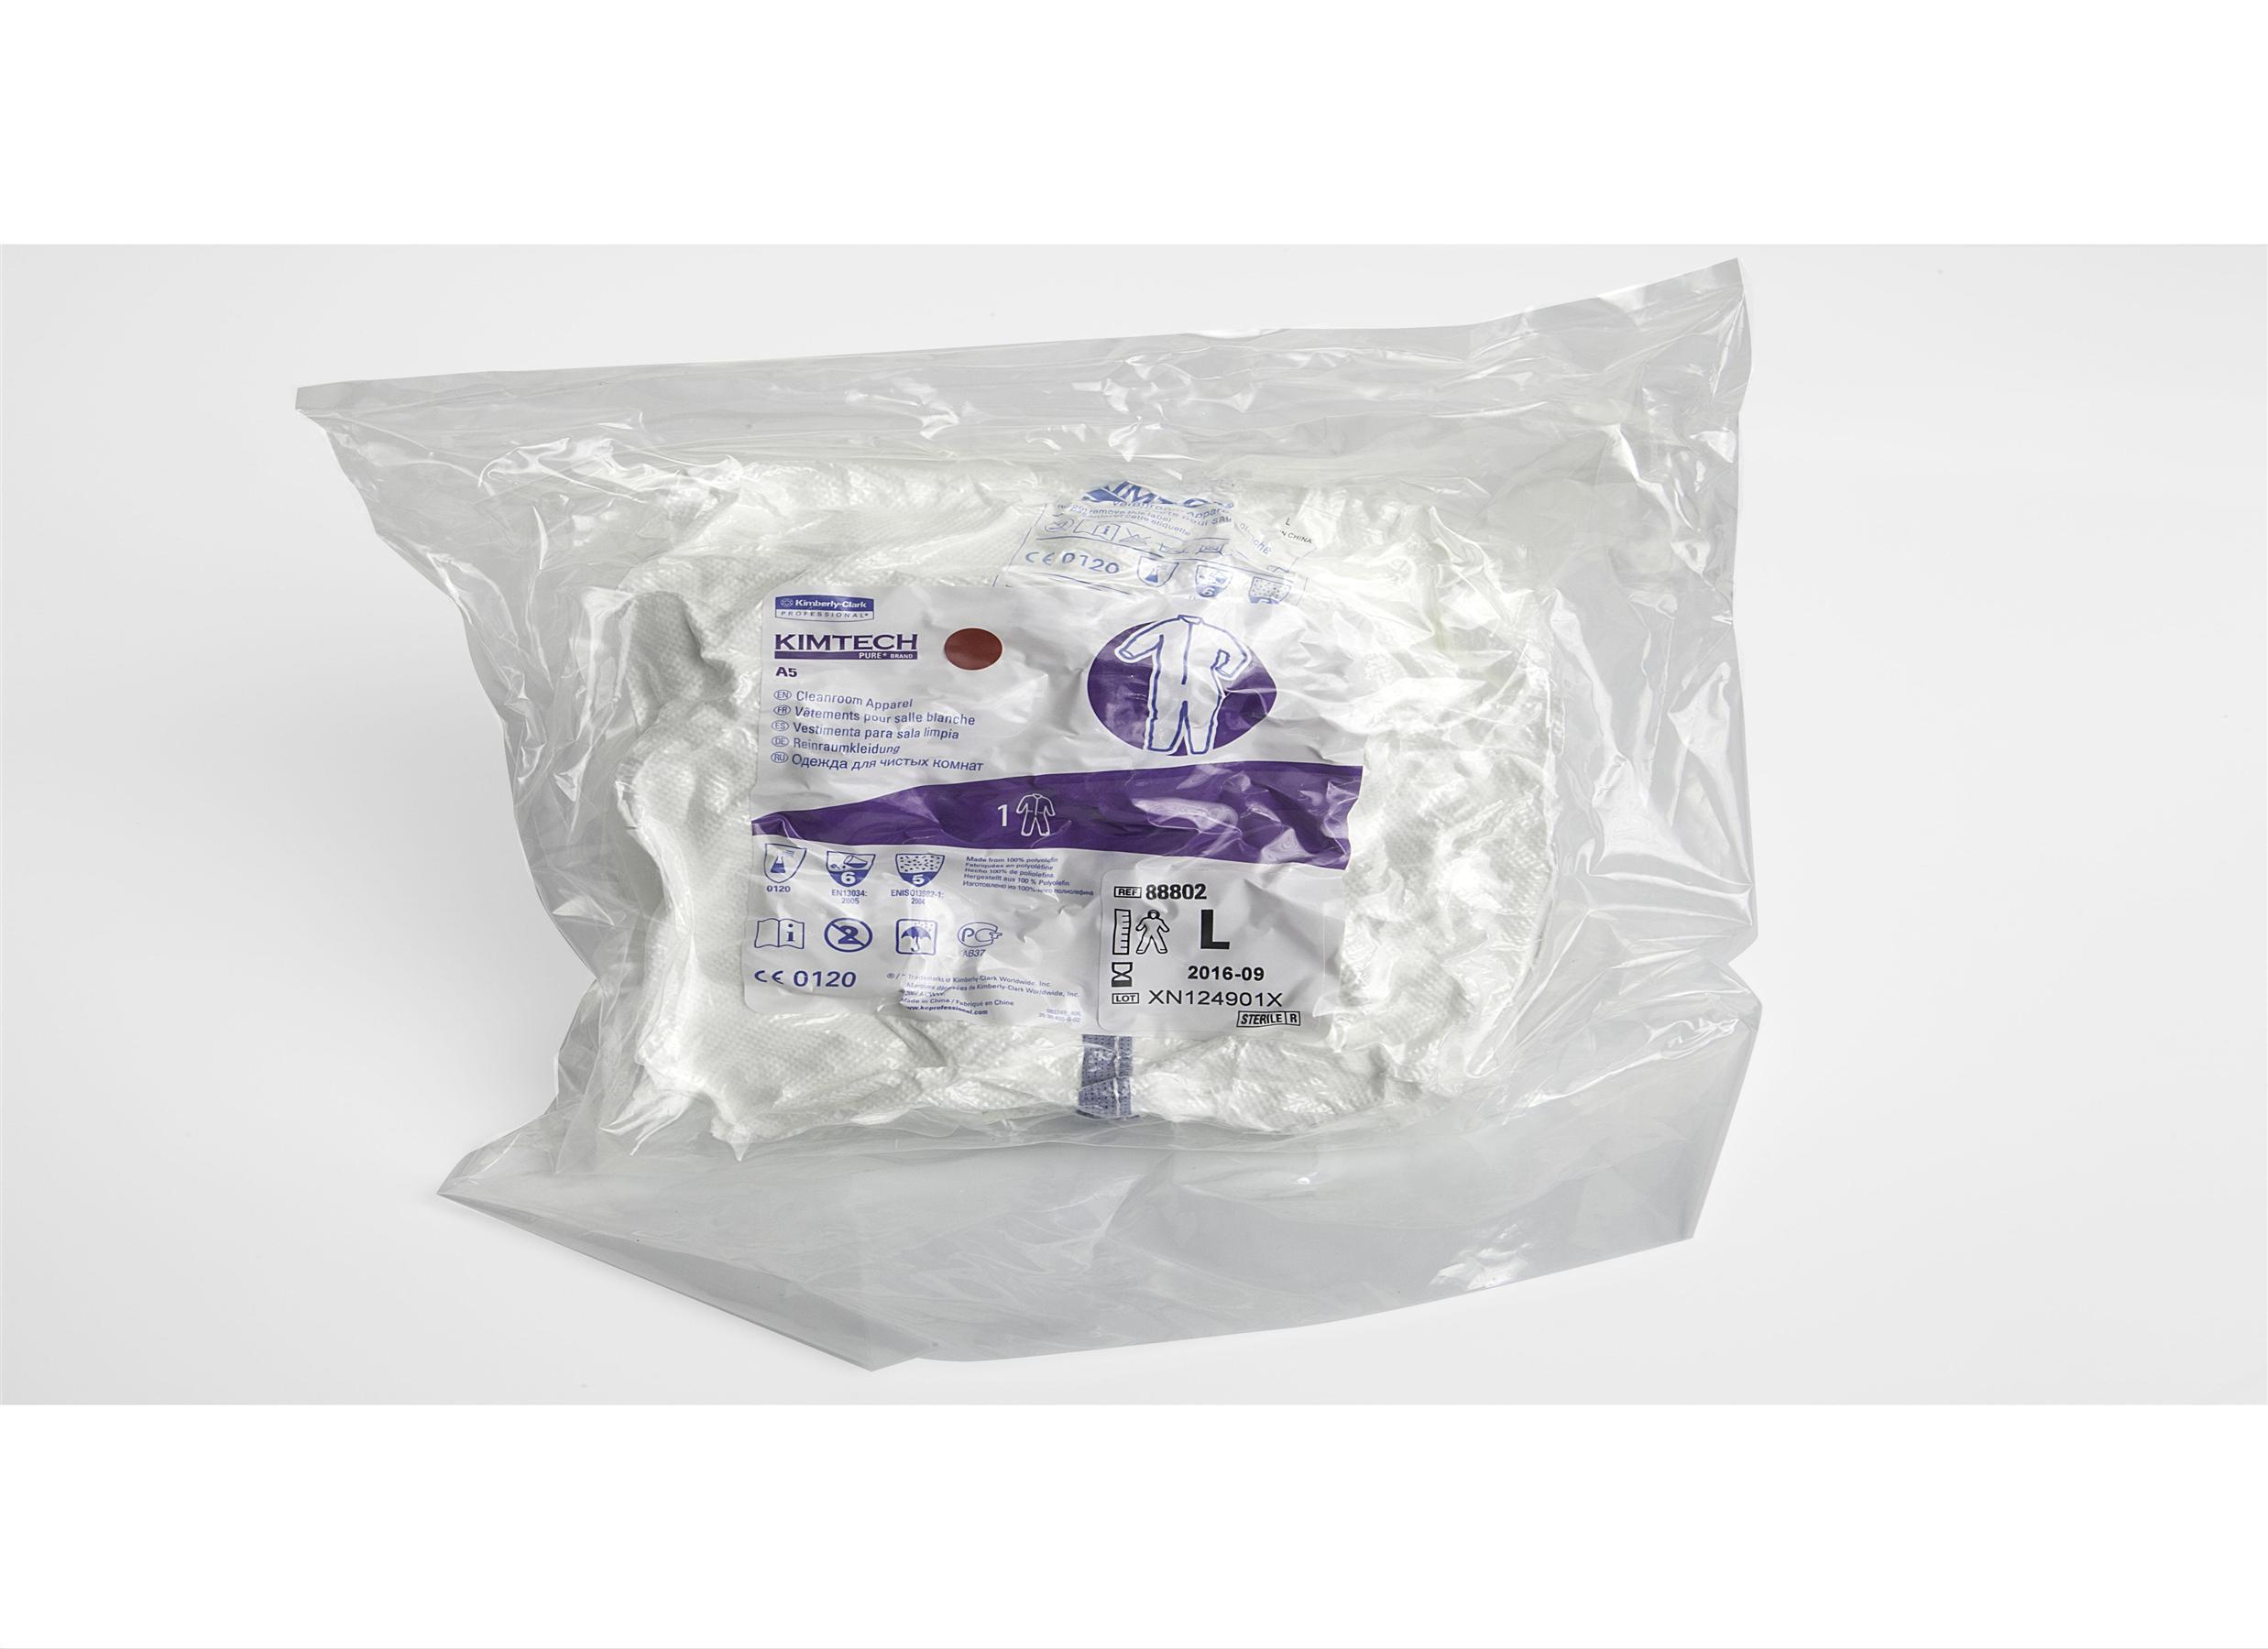 Kimtech A5 steriili kertakäyttöhaalari